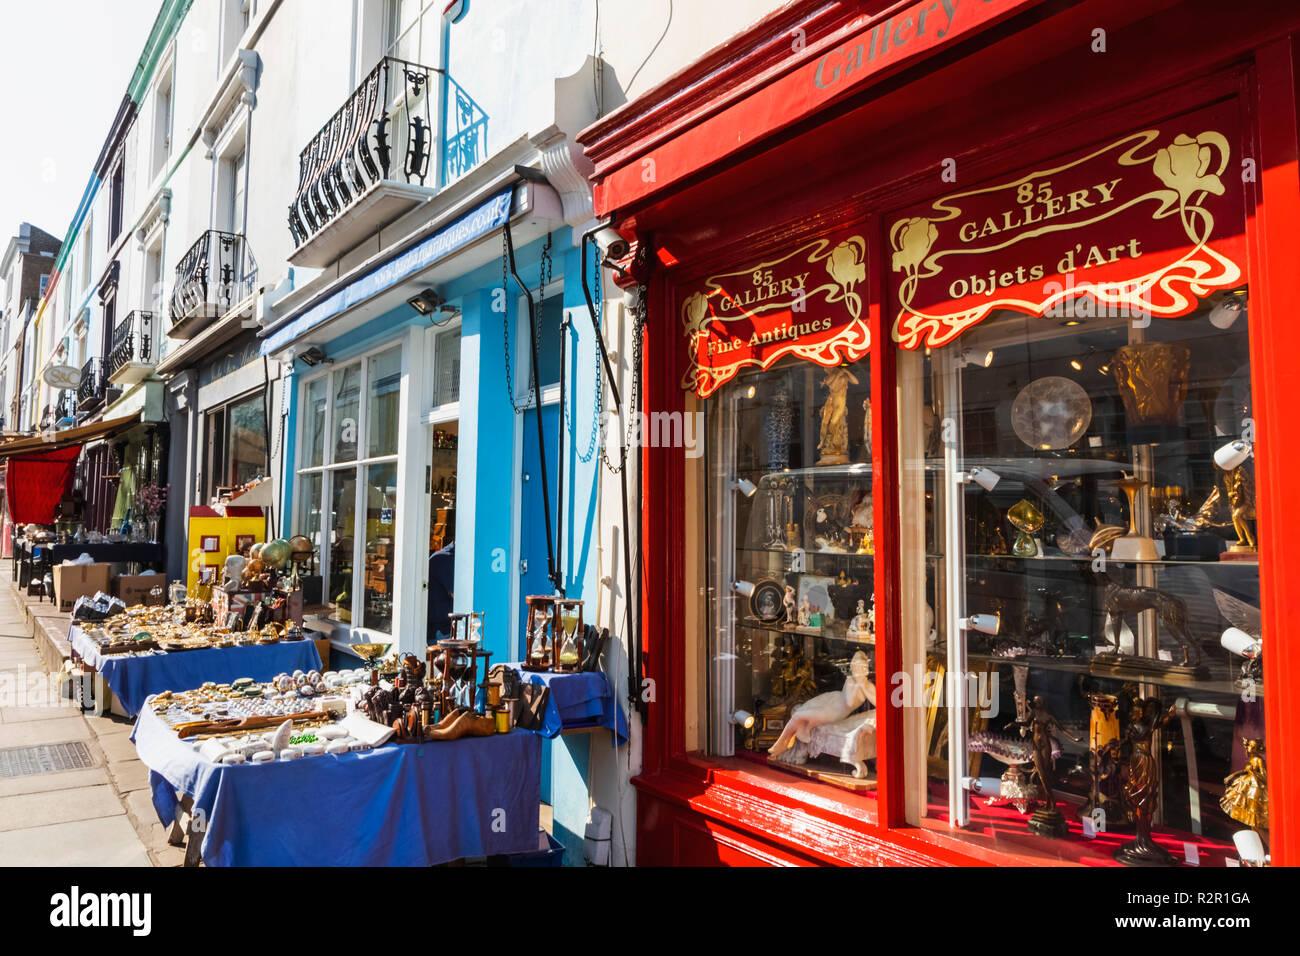 Inglaterra, Londres, Notting Hill, Portobello Road, tiendas de antigüedades Foto de stock